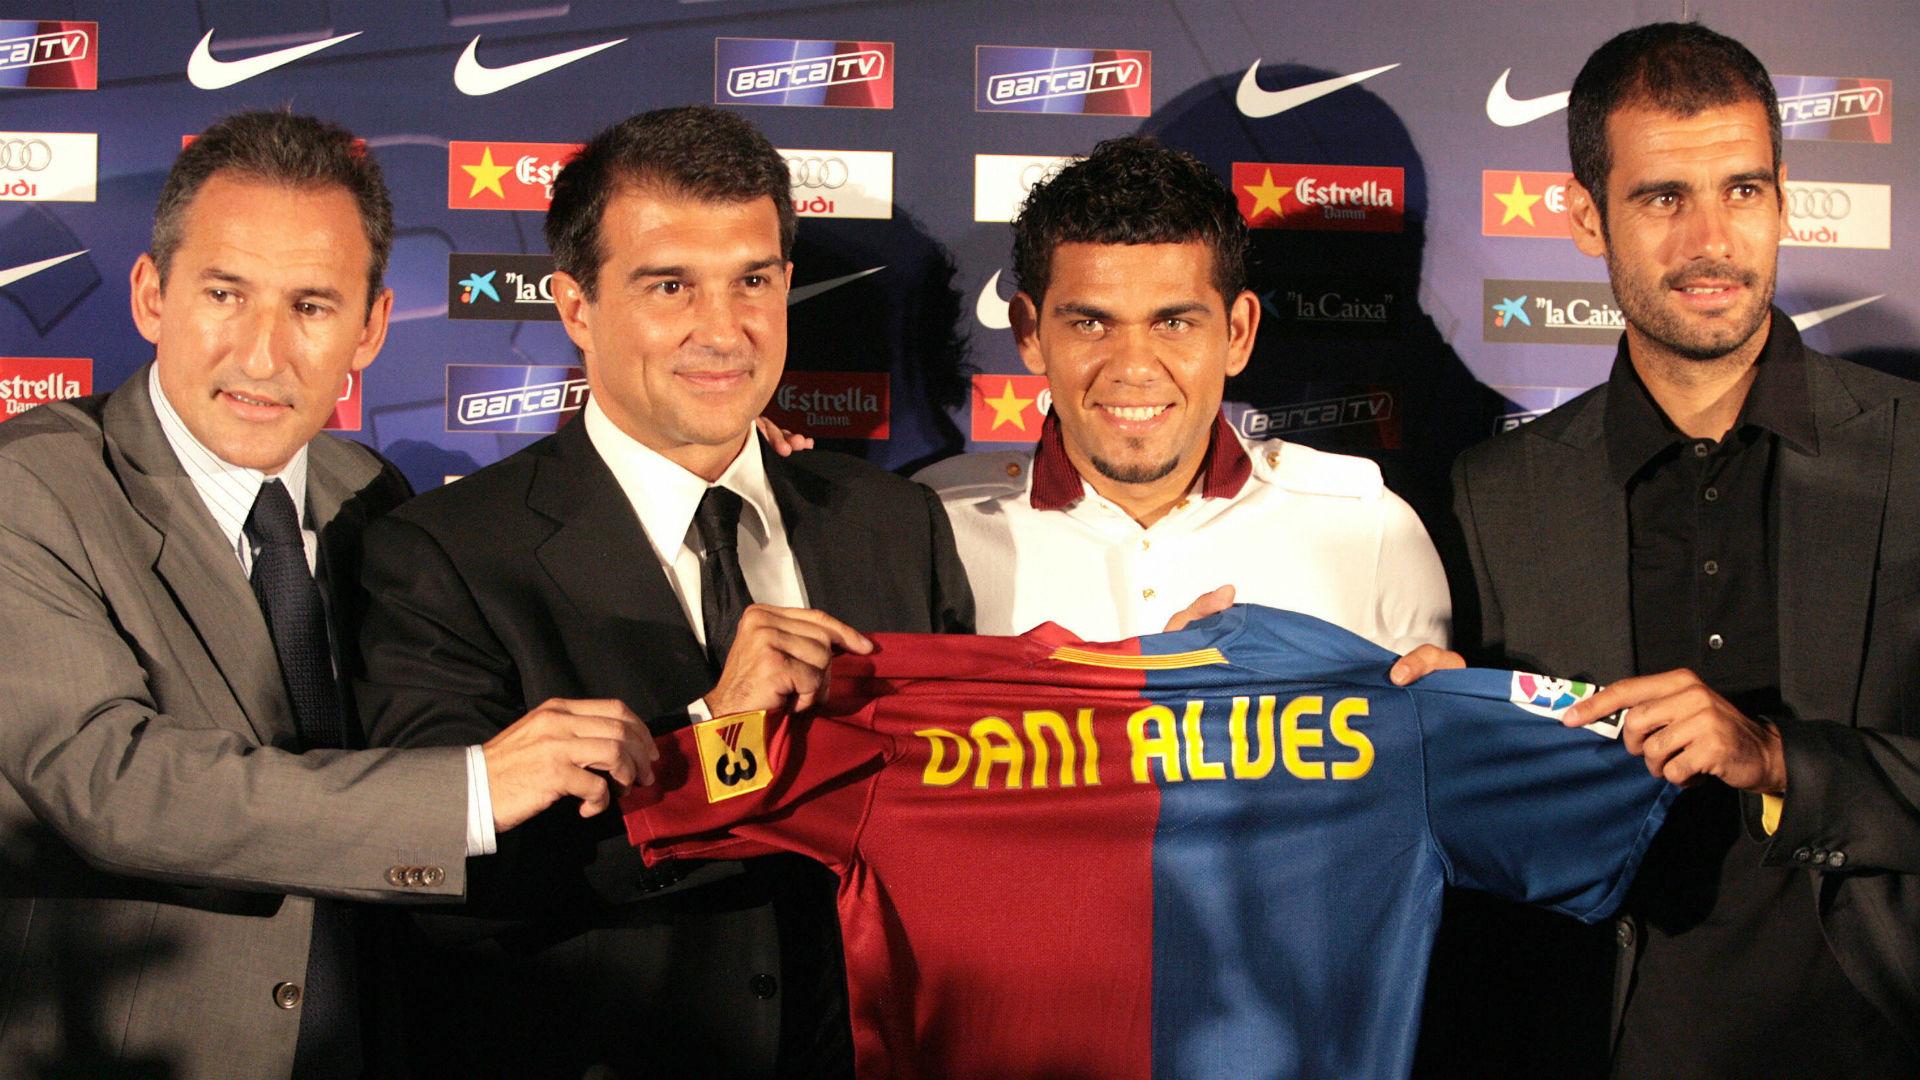 Txiki Begiristain Joan Laporte Dani Alves Pep Guardiola Barcelona